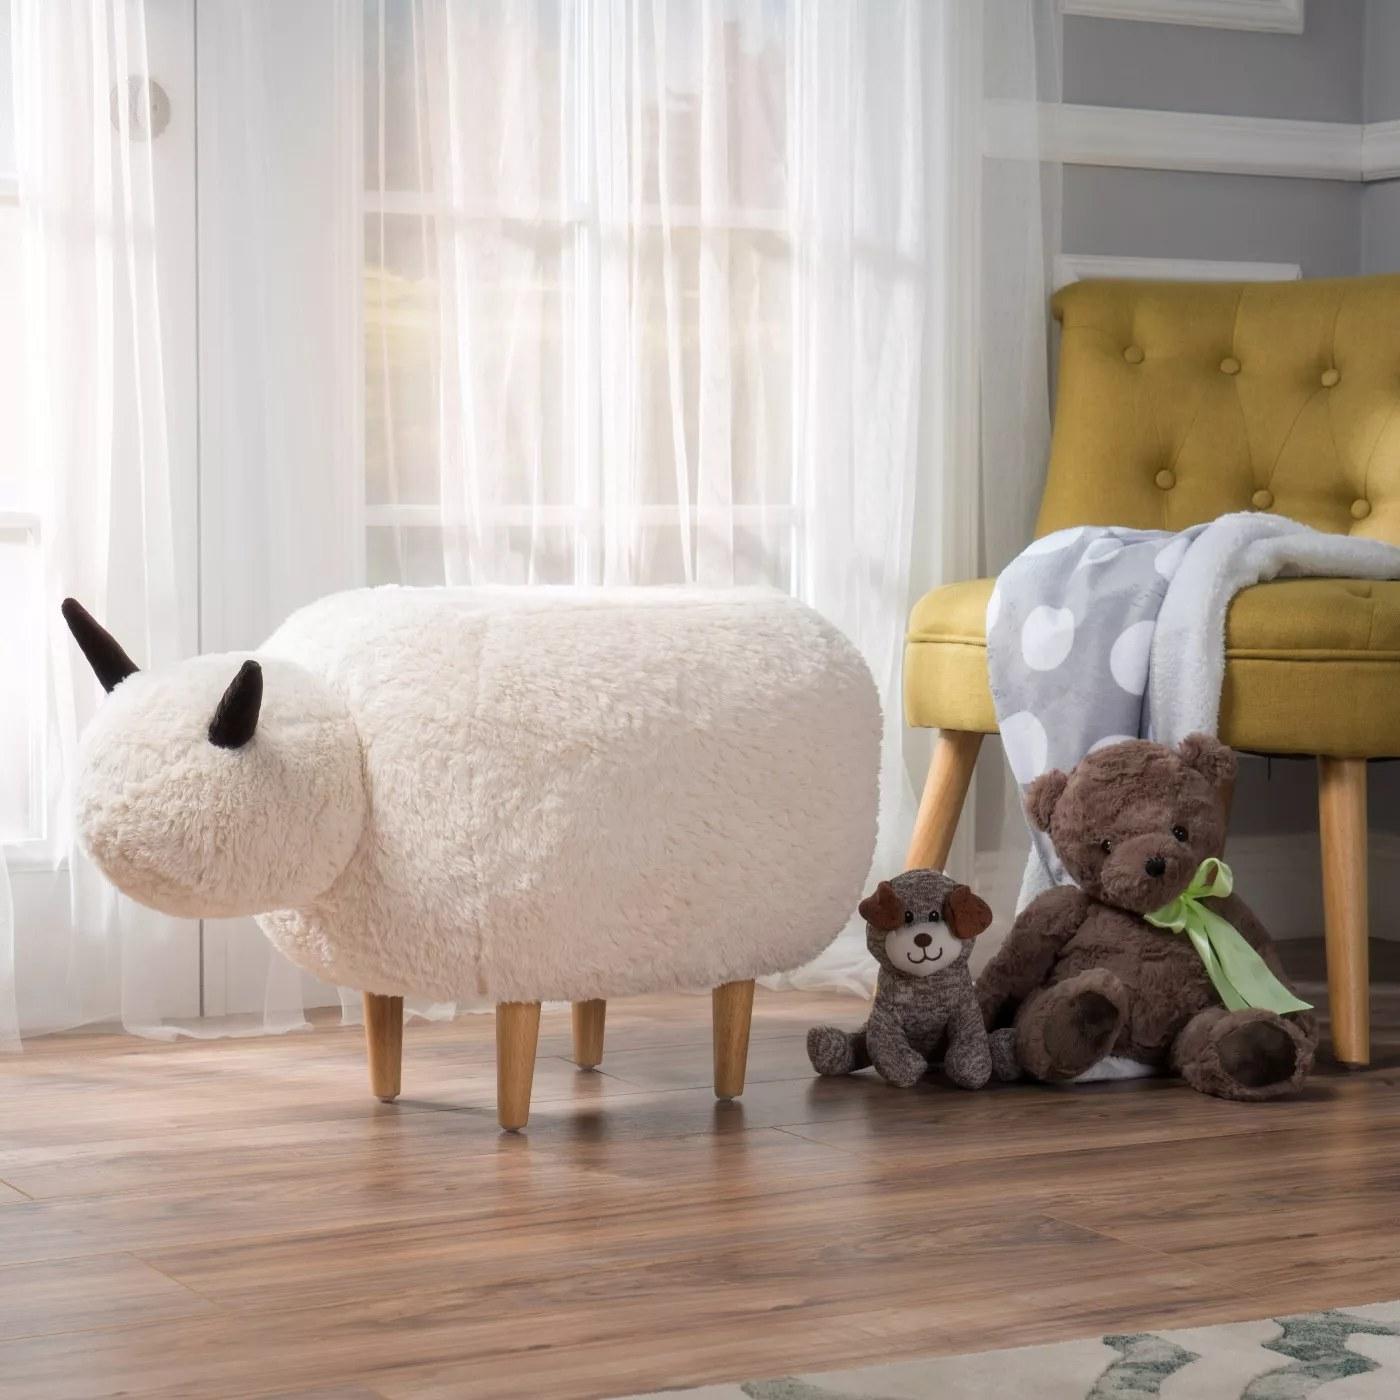 The sheep-shaped ottoman